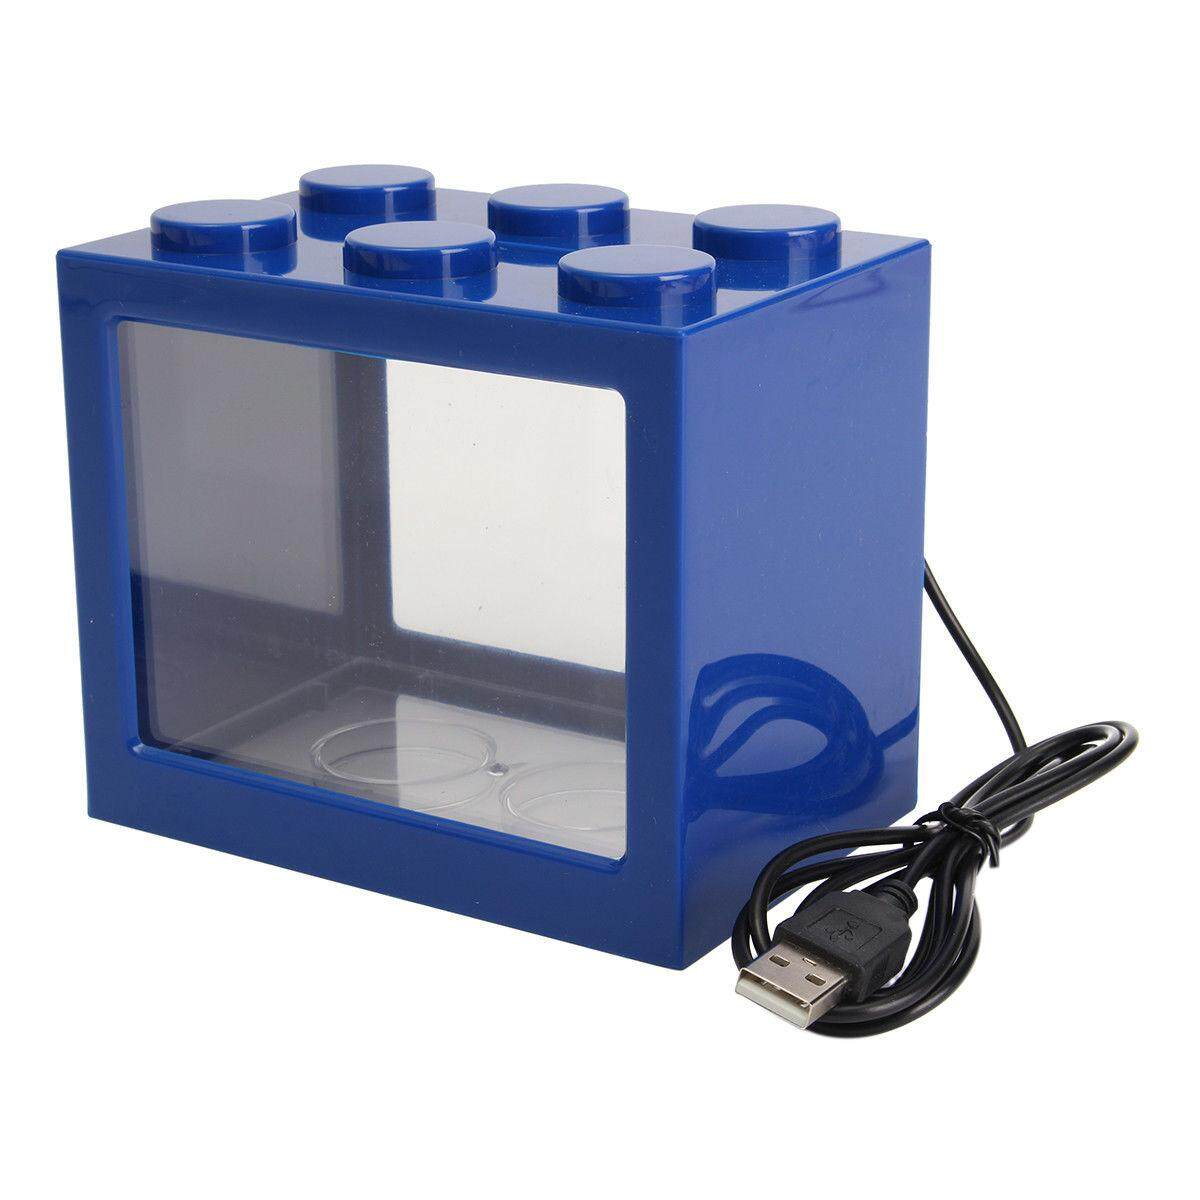 Mini USB LED Lighting Clear Fish Tank Ornament Aquarium Office Desktop Décor